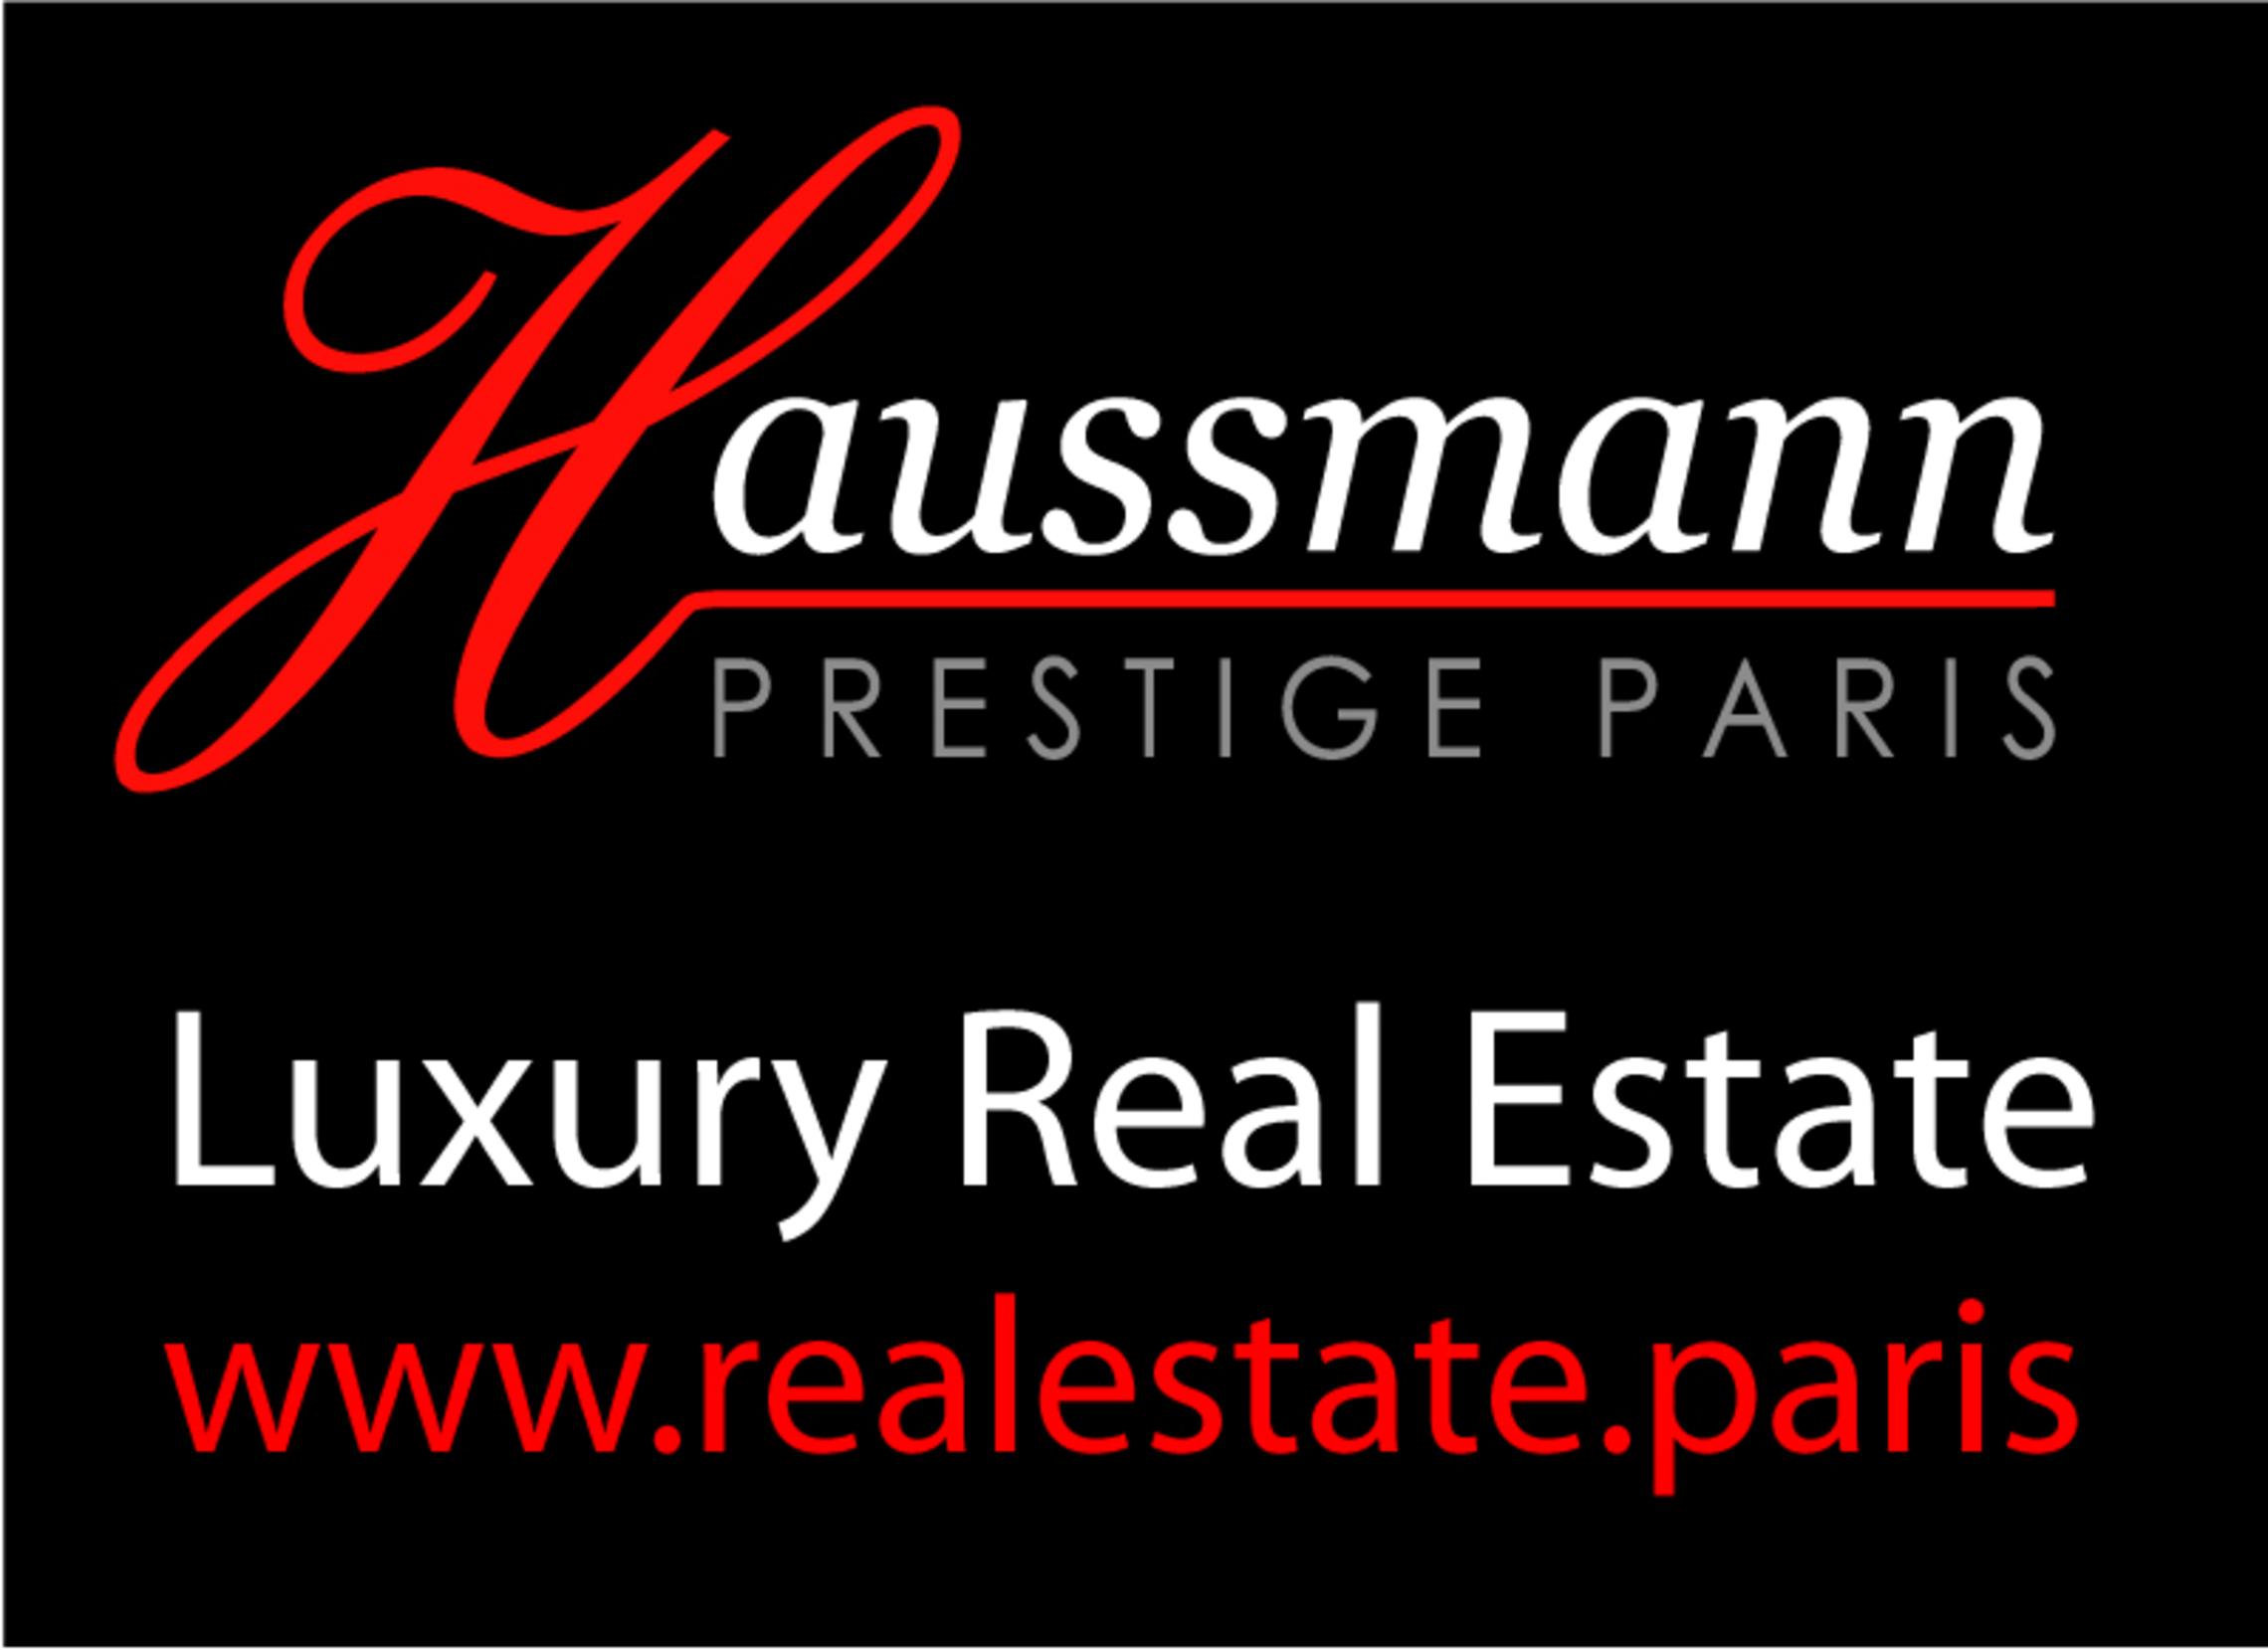 haussmann prestige paris- company logo